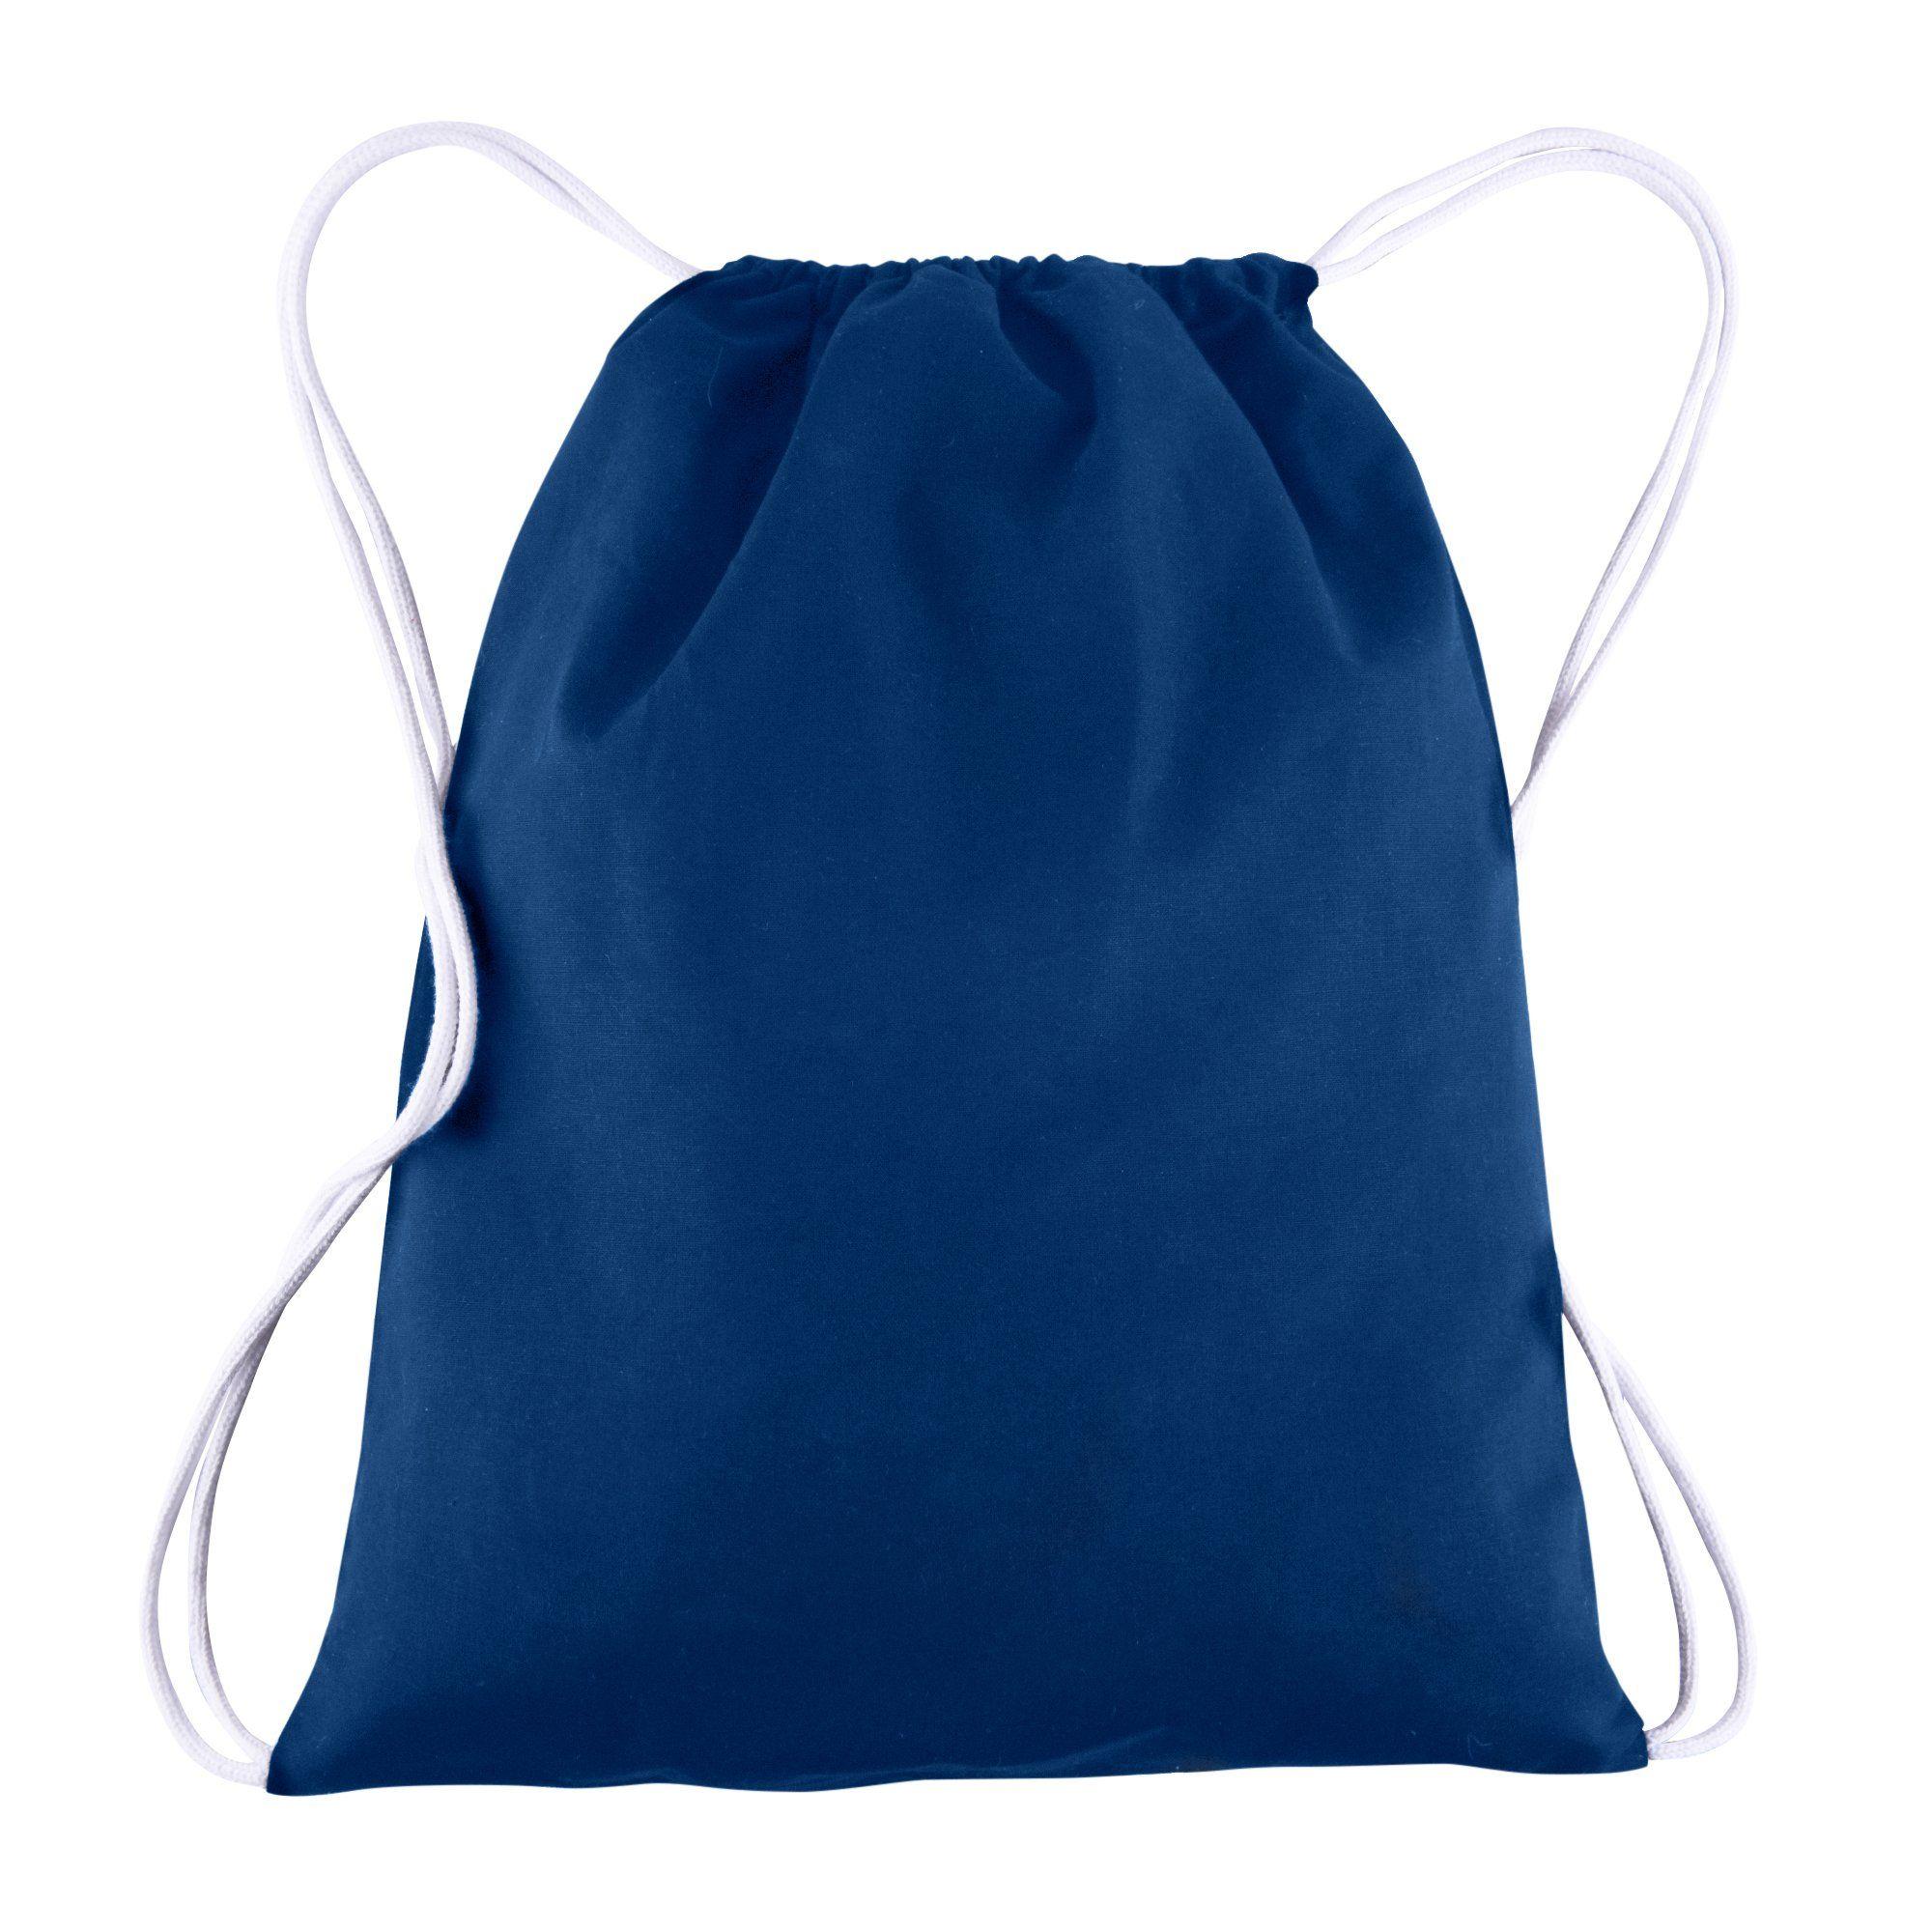 Cotton Canvas Drawstring Backpacks Bags 12 Pack Bulk